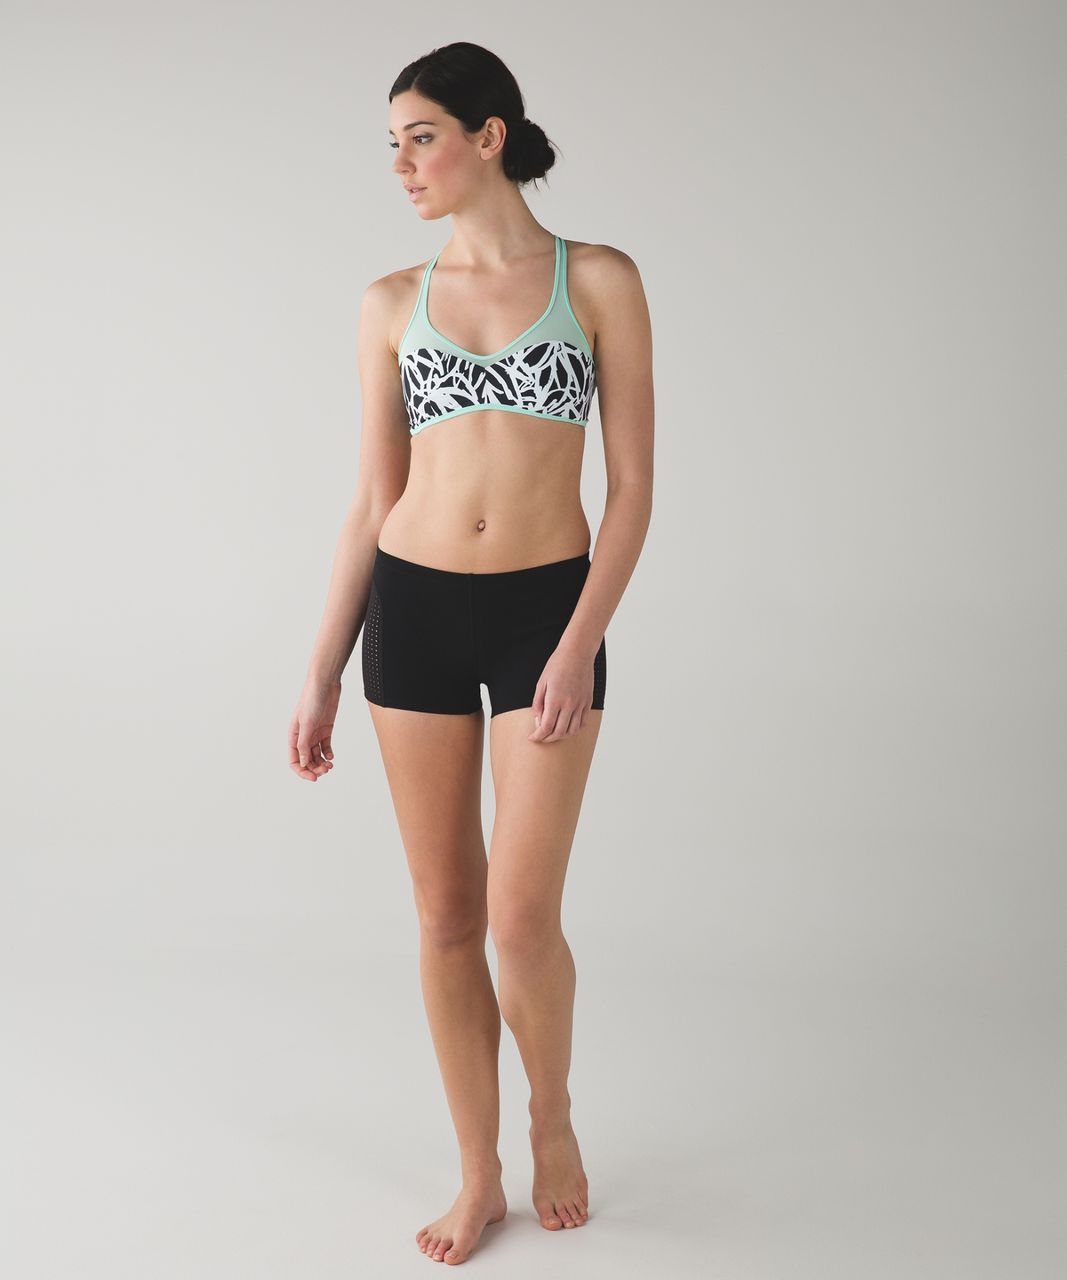 Lululemon Water:  Salty Swim Sport Top - Toothpaste / Sketch Palm White Black